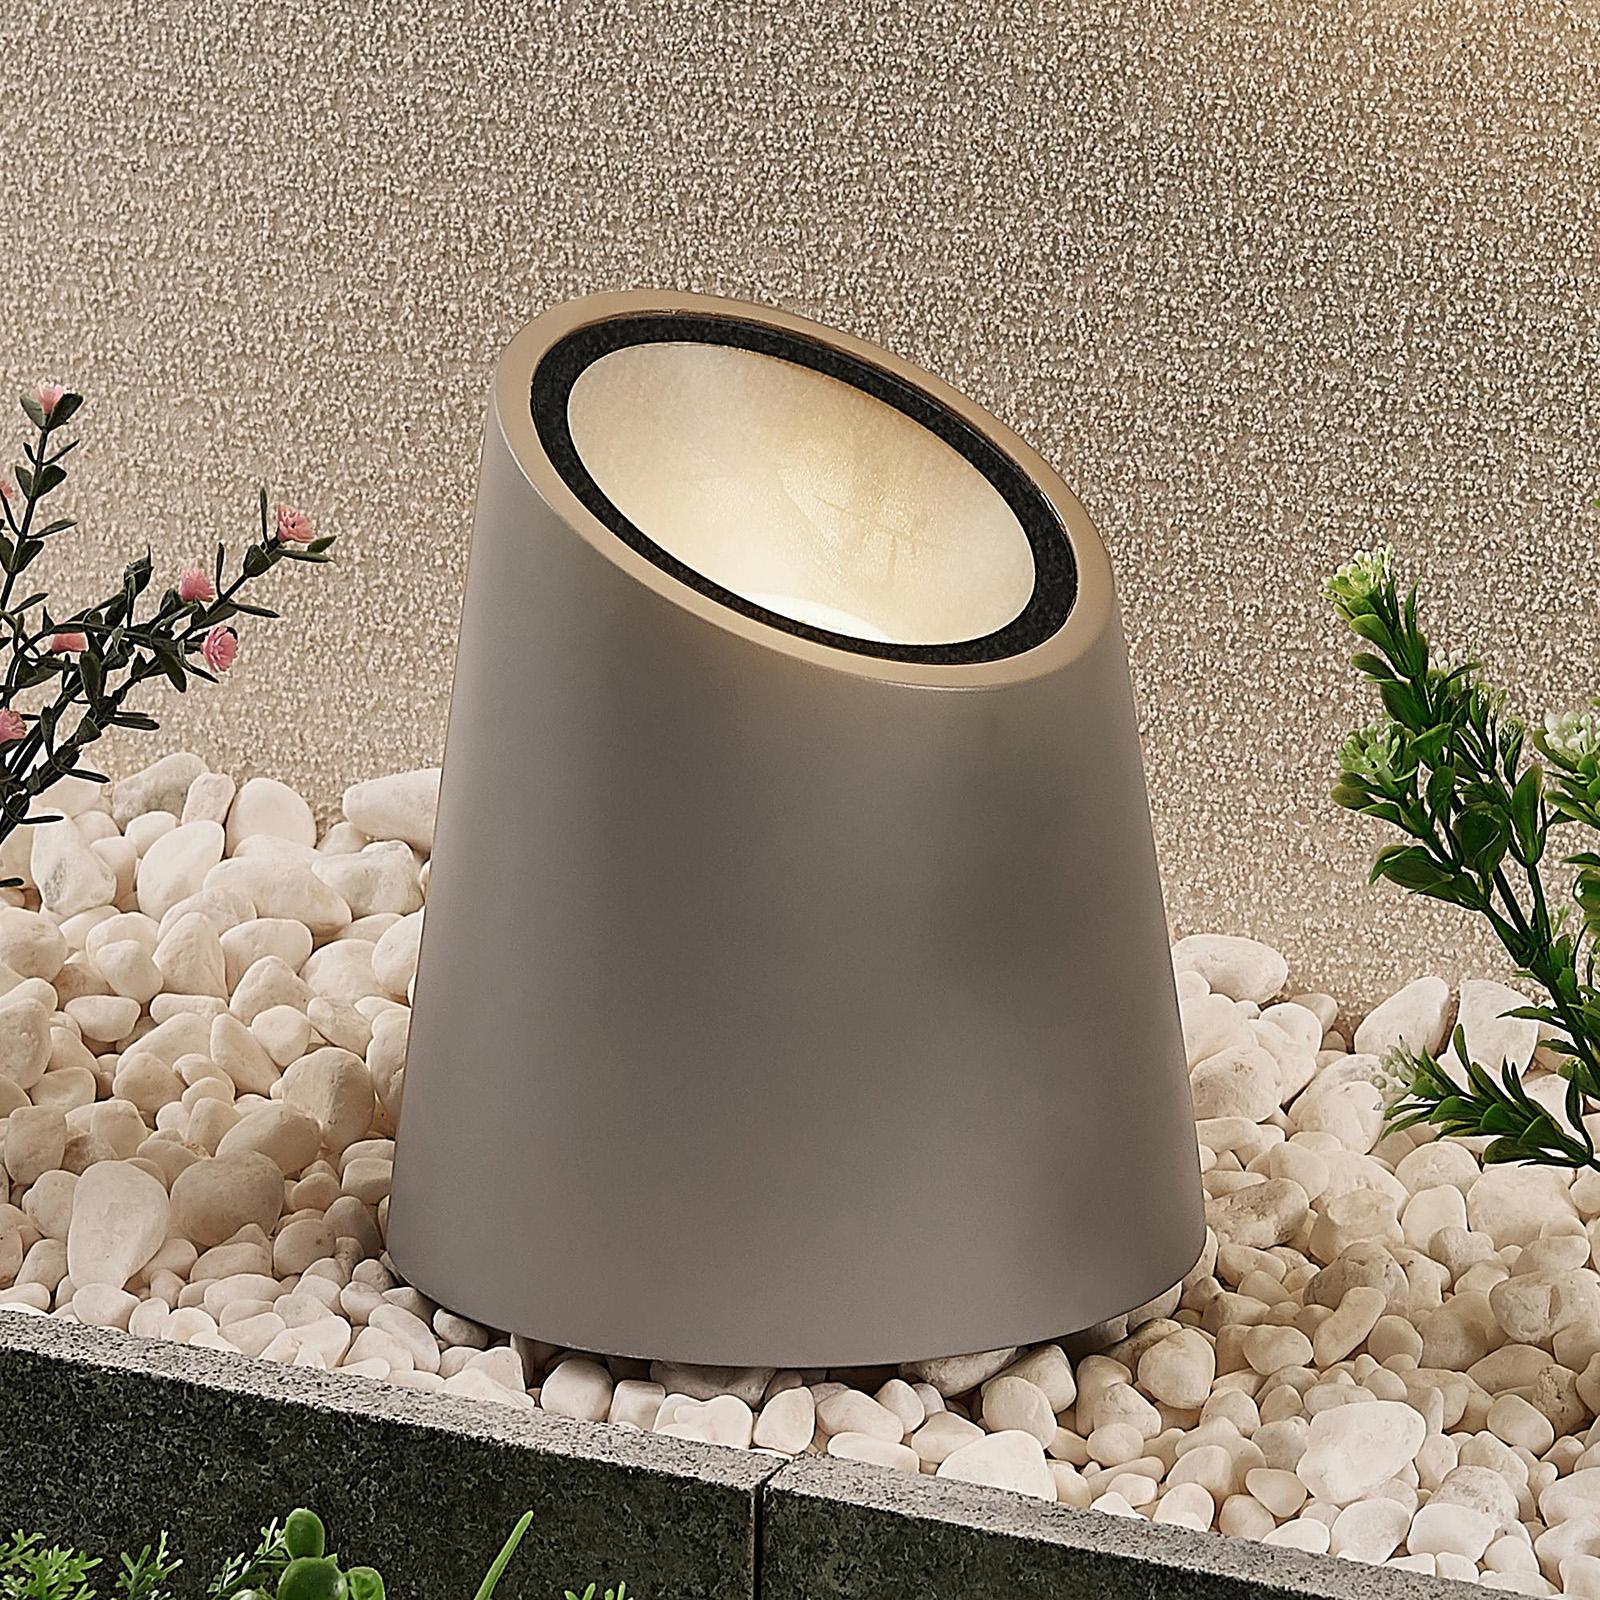 Lucande gulvlampe Andri, udendørsspot, beton